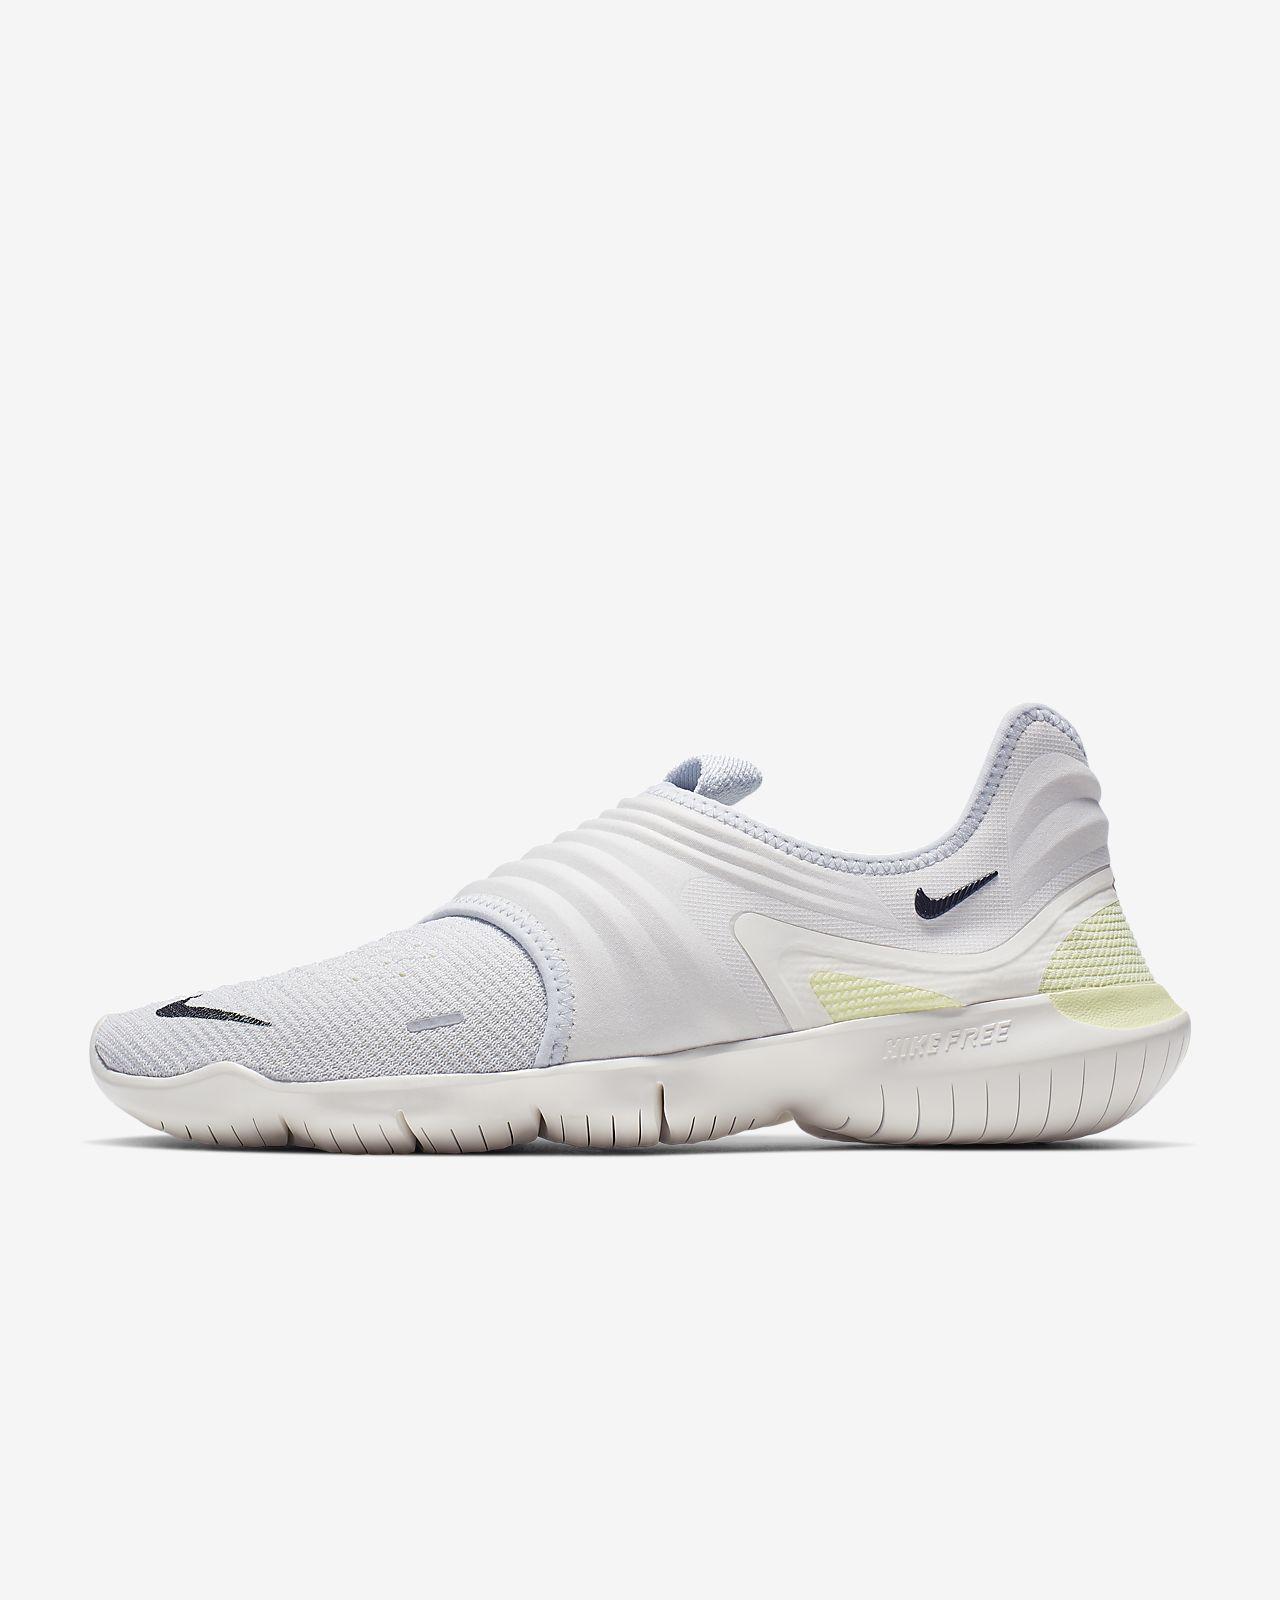 38c43b881f7 Nike Free RN Flyknit 3.0 Men s Running Shoe. Nike.com SG